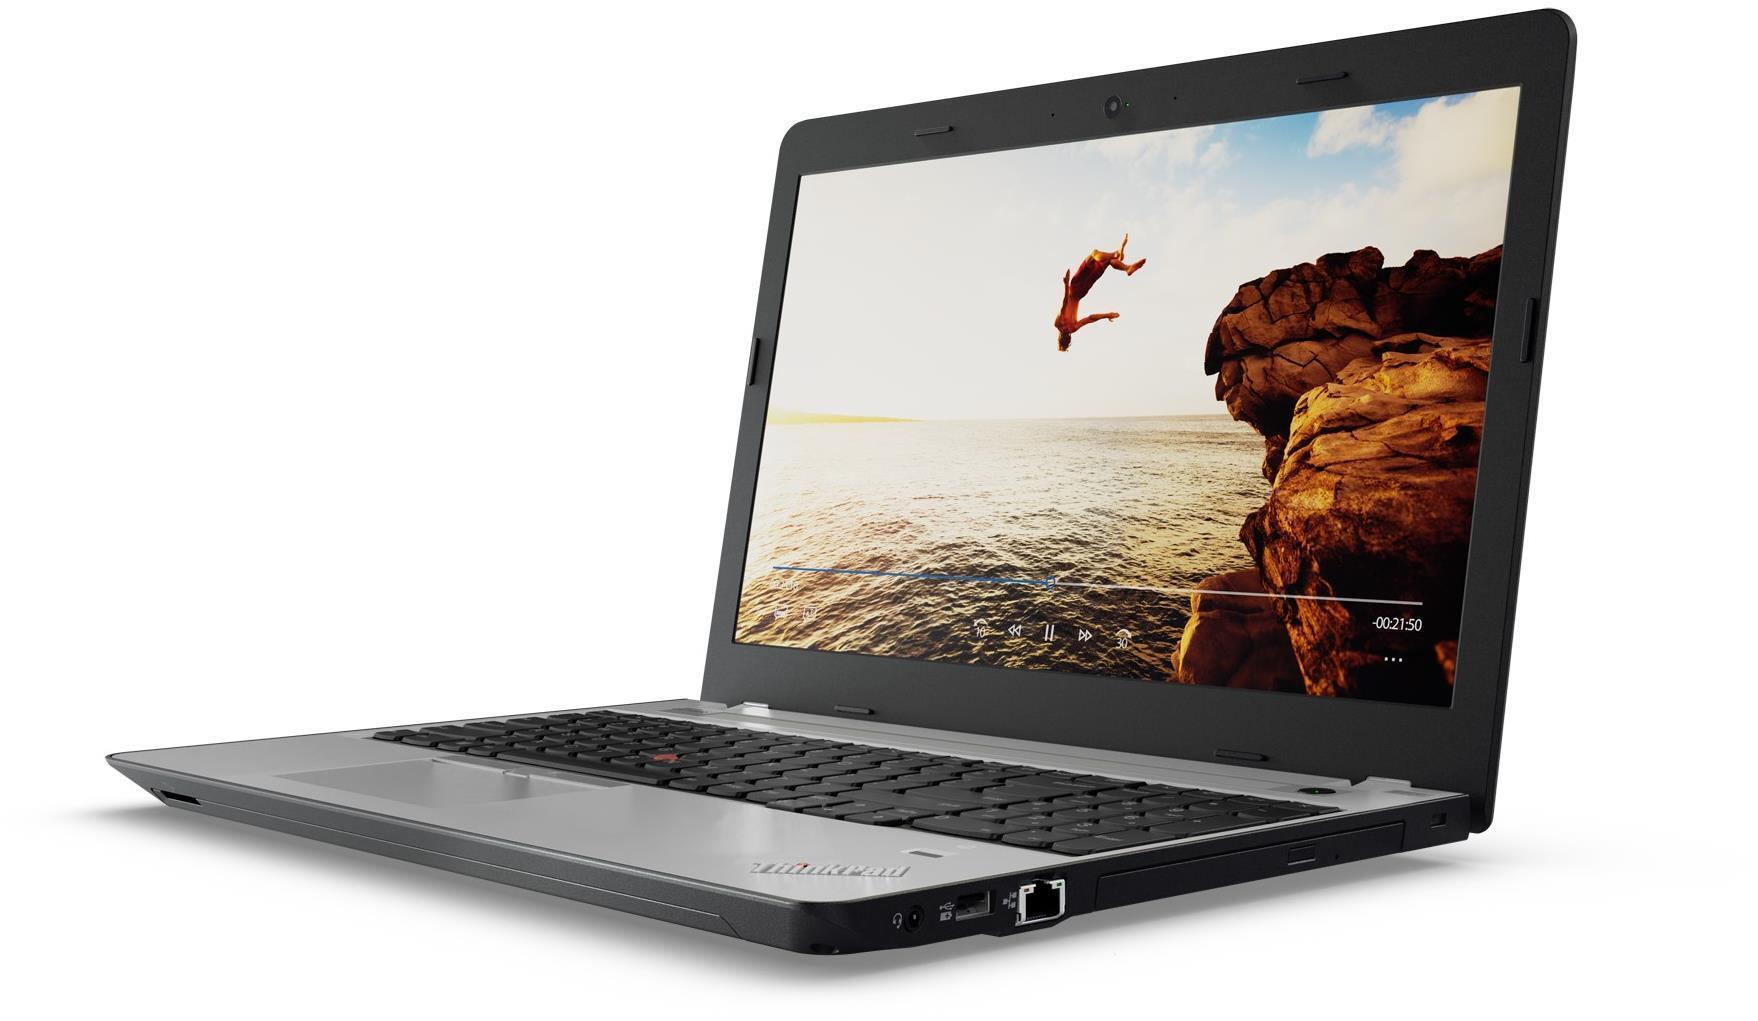 "Lenovo ThinkPad E570 i5-7200U/8GB/256GB SSD/DVD±RW/GeForce 940MX 2GB/15,6""FHD IPS matný/Win10 černo-stříbrný"